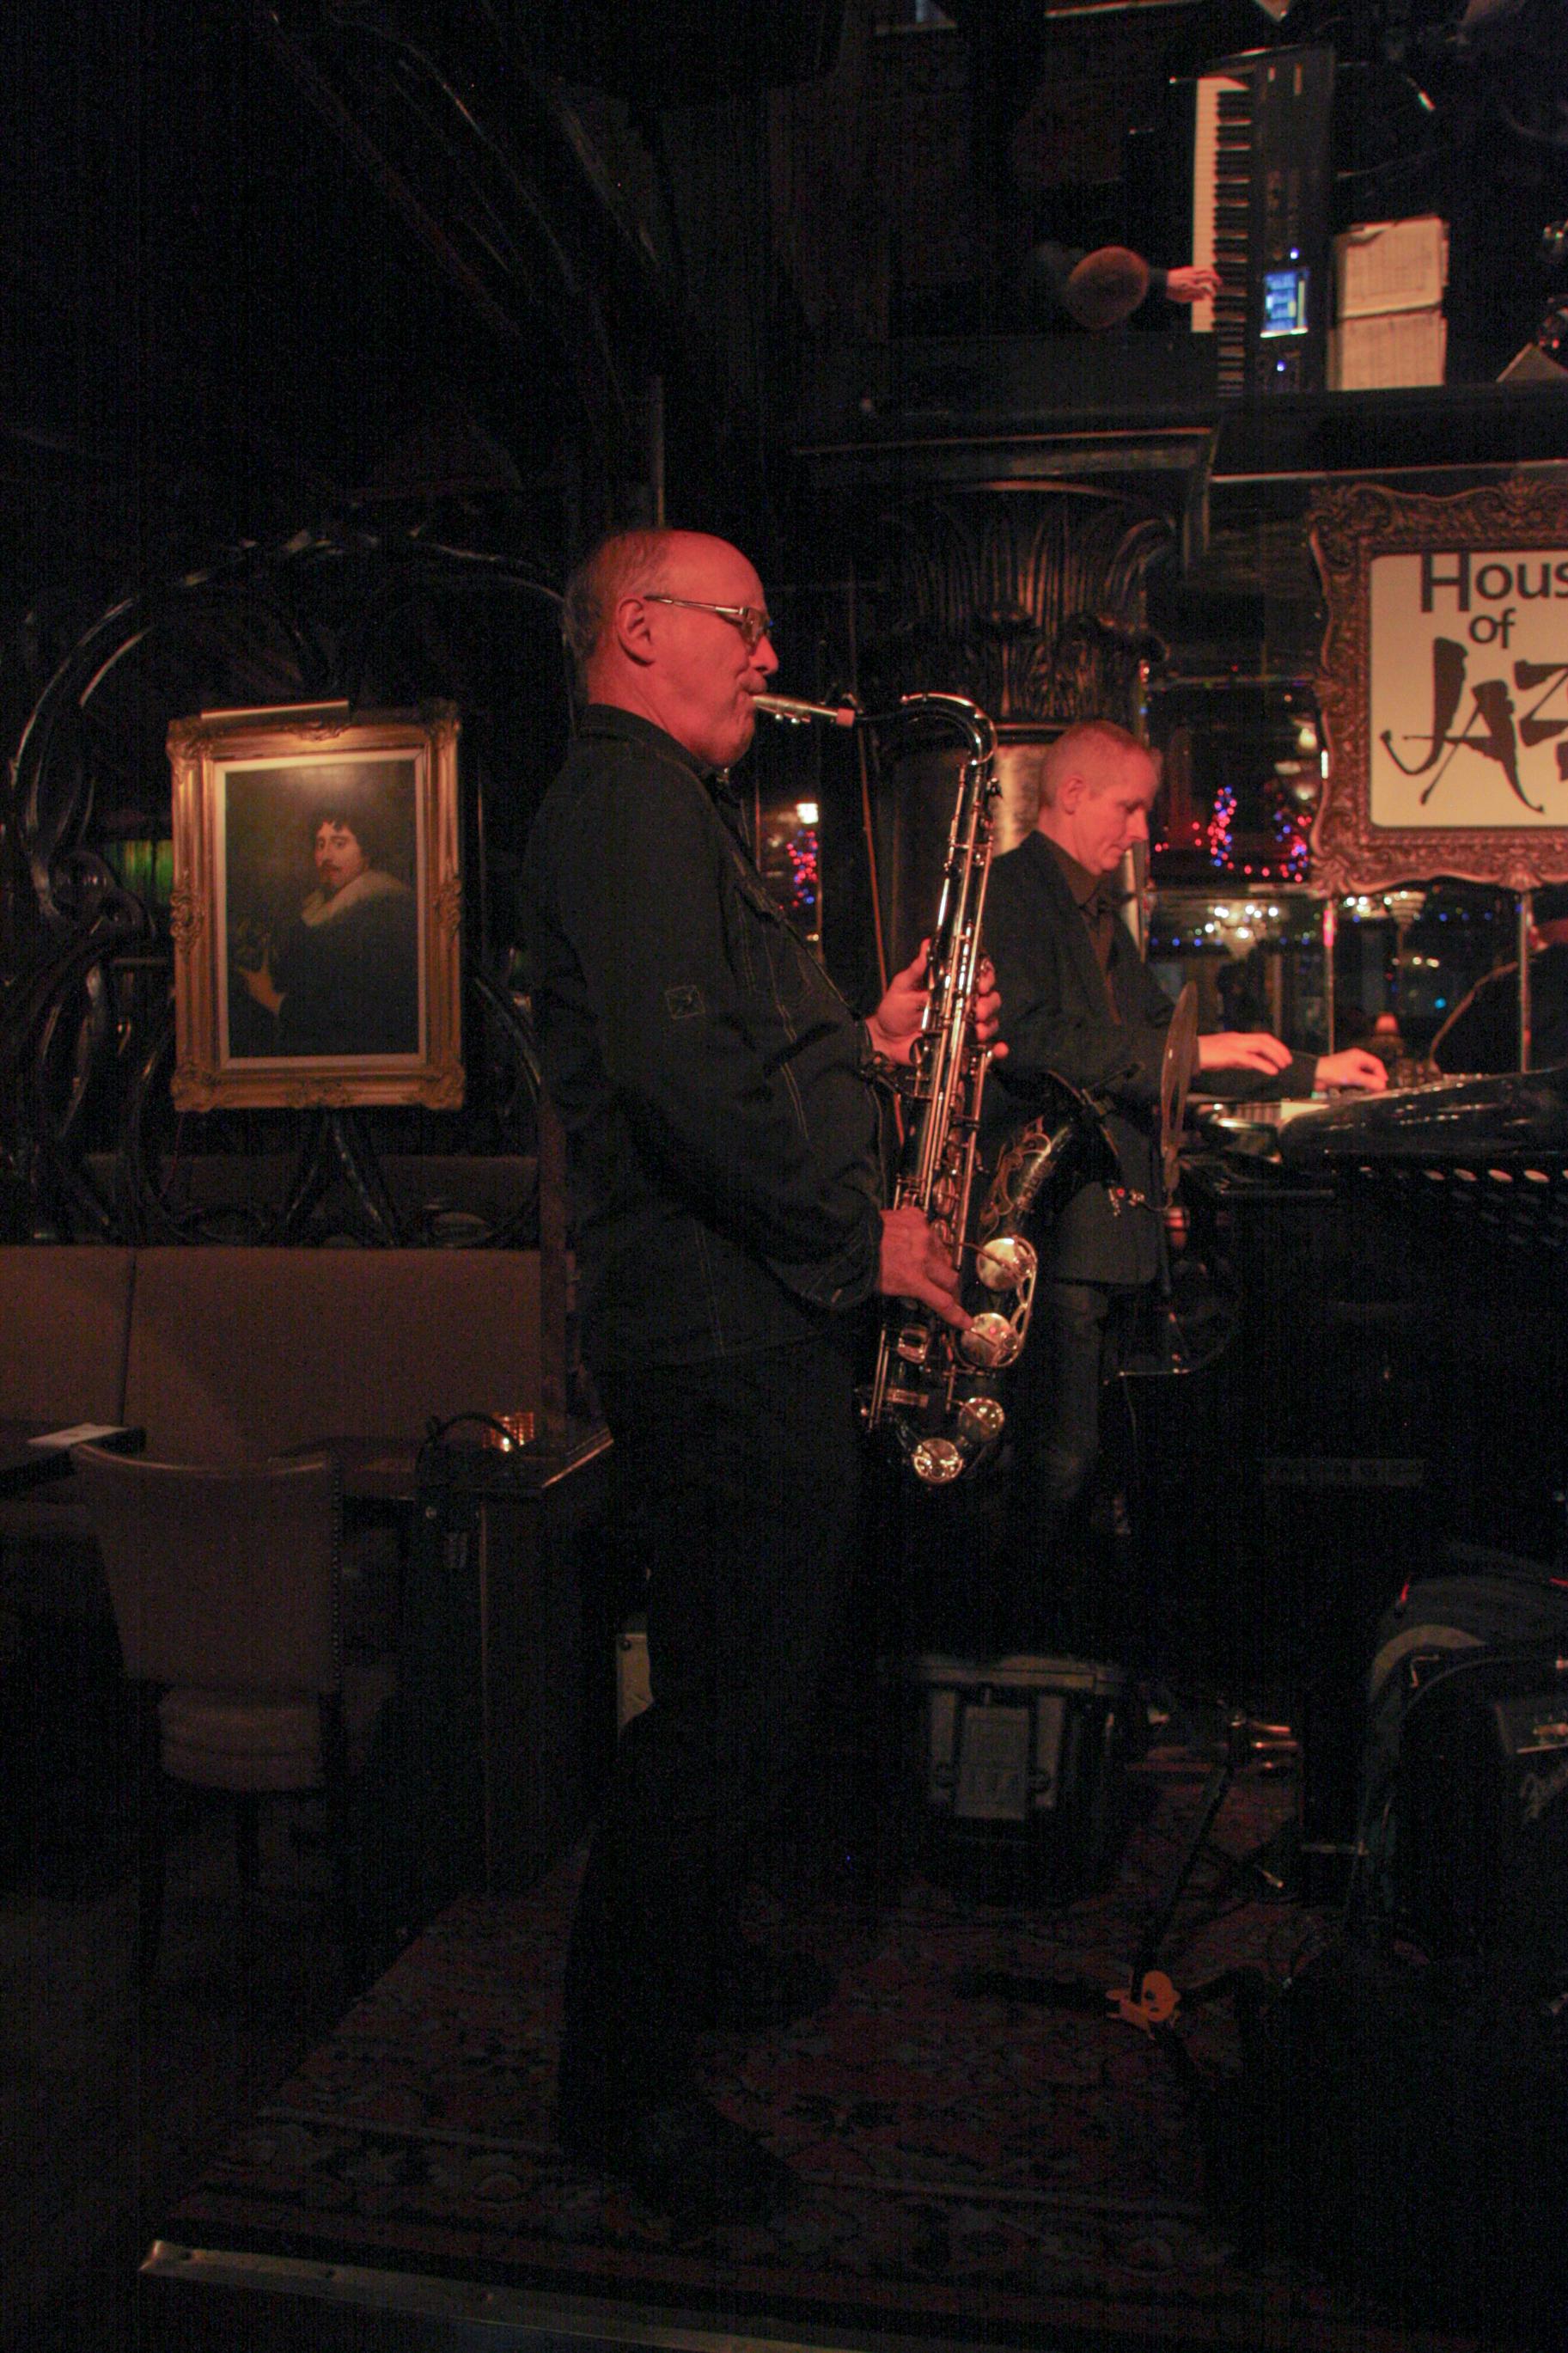 House of Jazz-4596.jpg